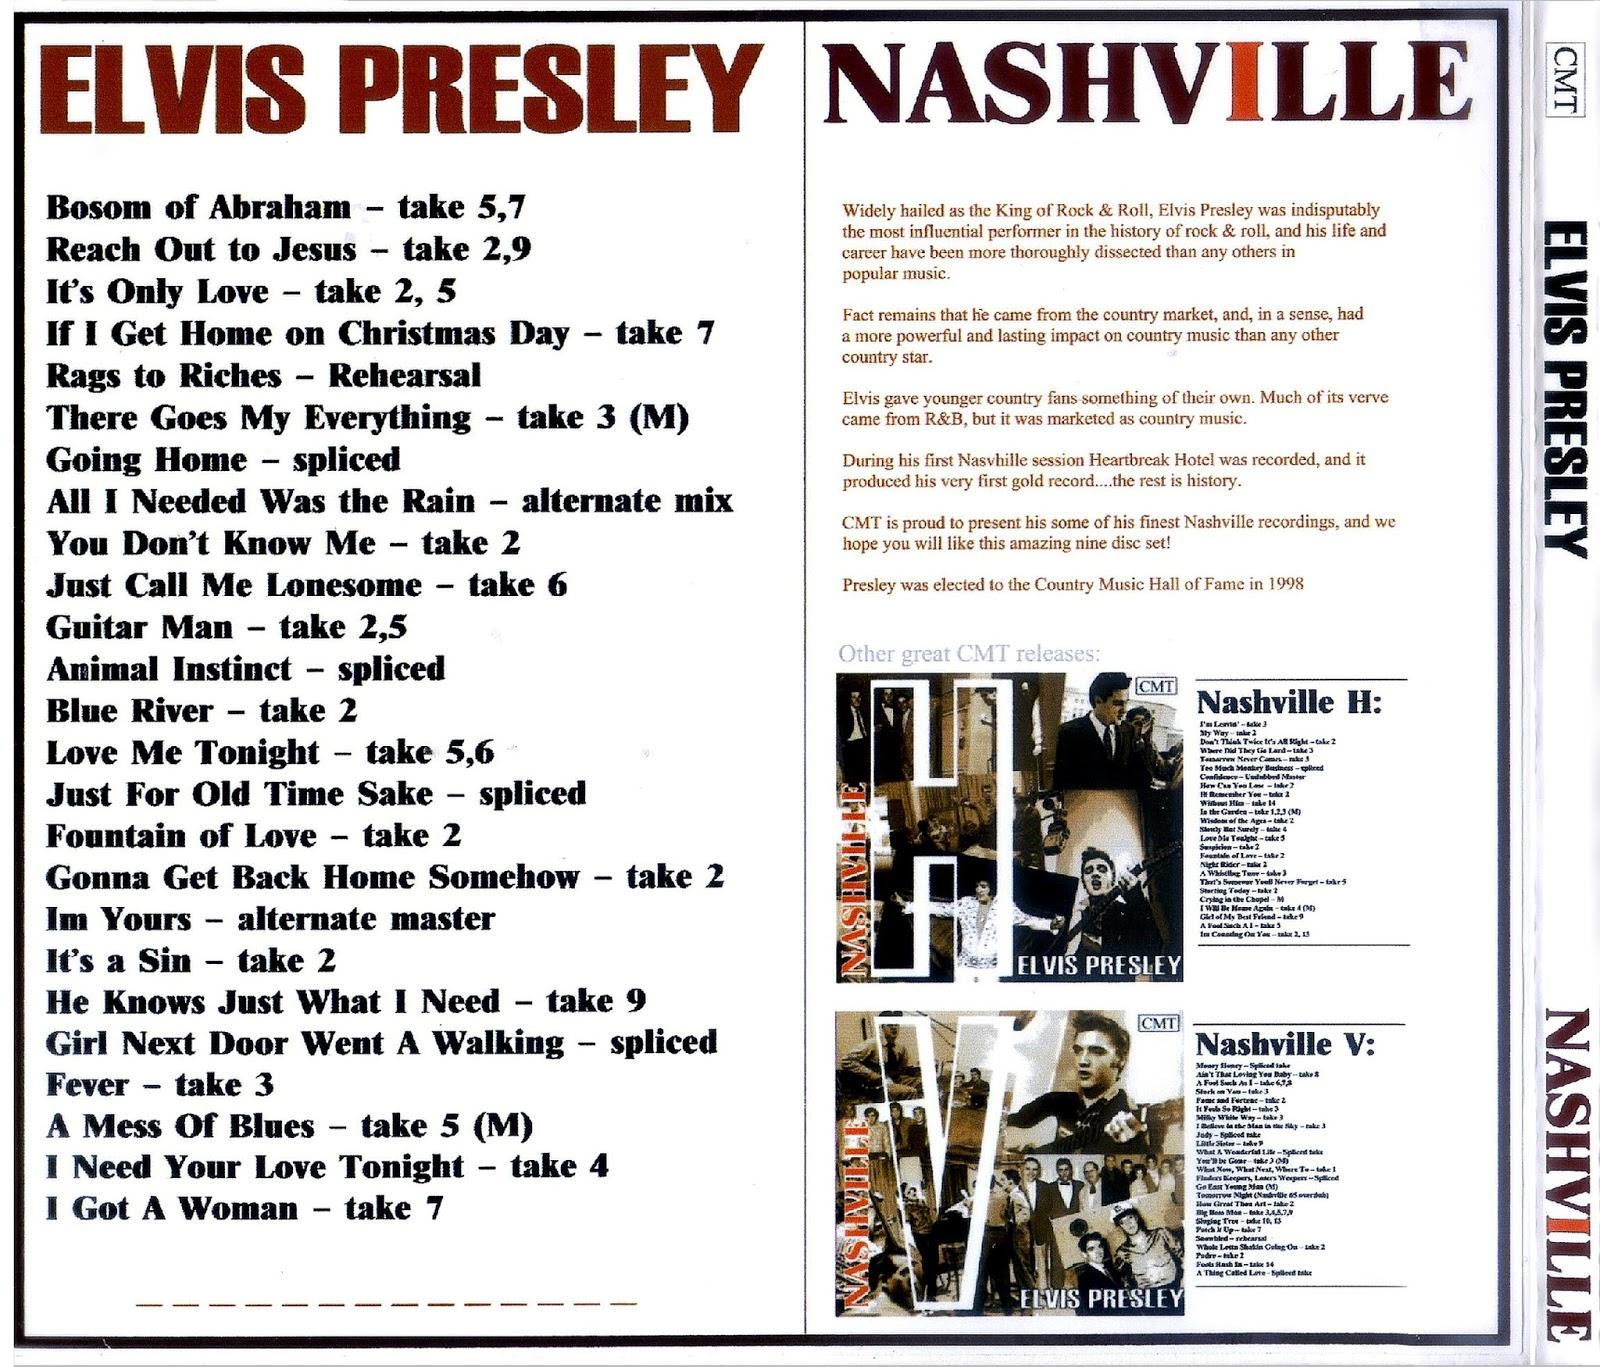 Elvis Presley For Friends In Flac November 2019